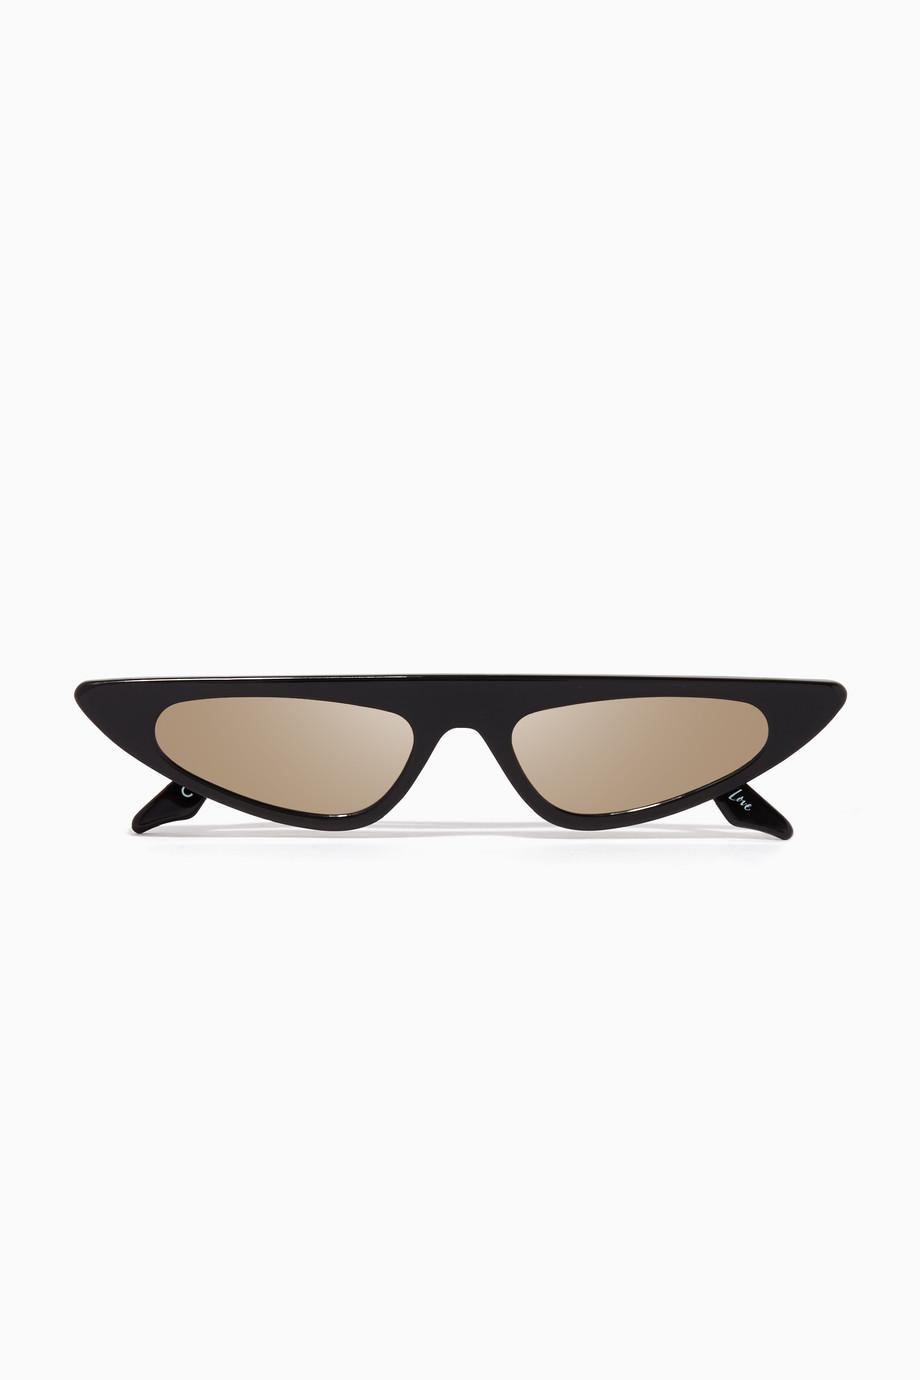 feab93470 تسوق نظارة فلورنسا شمسية بشكل عين القطة سوداء اندي وولف أسود للنساء ...